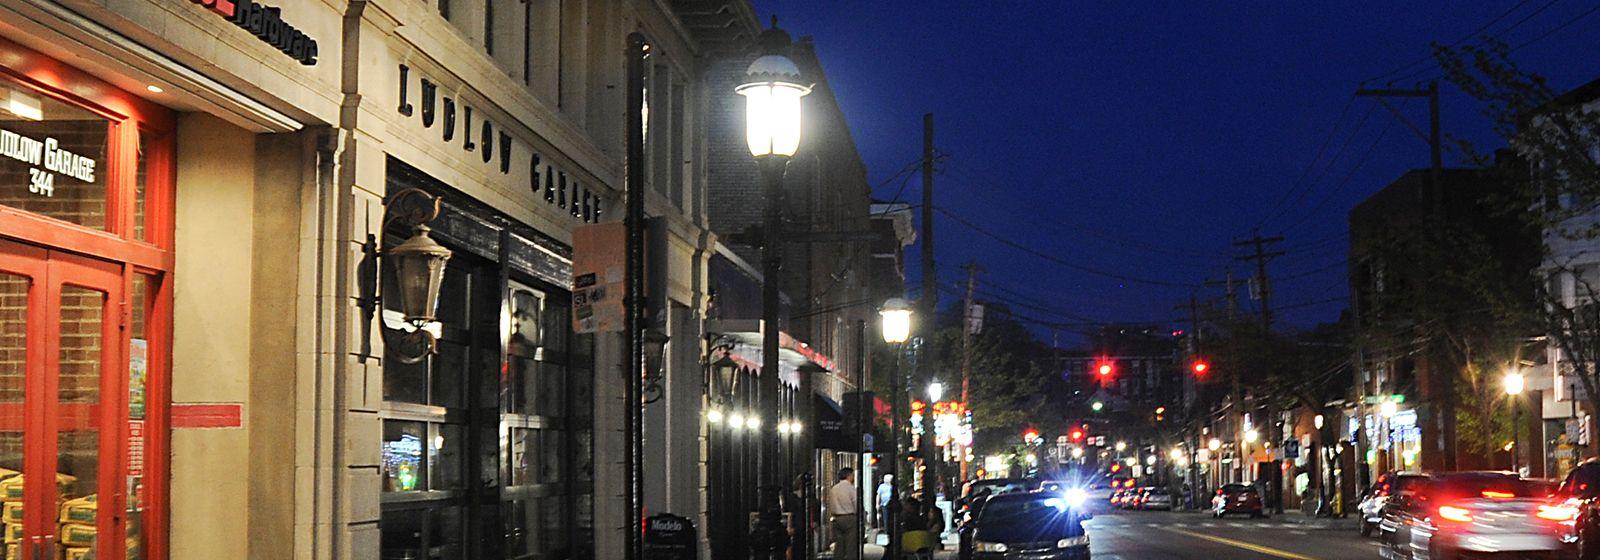 Magic glows in the night in Cincinnati's Gaslight District